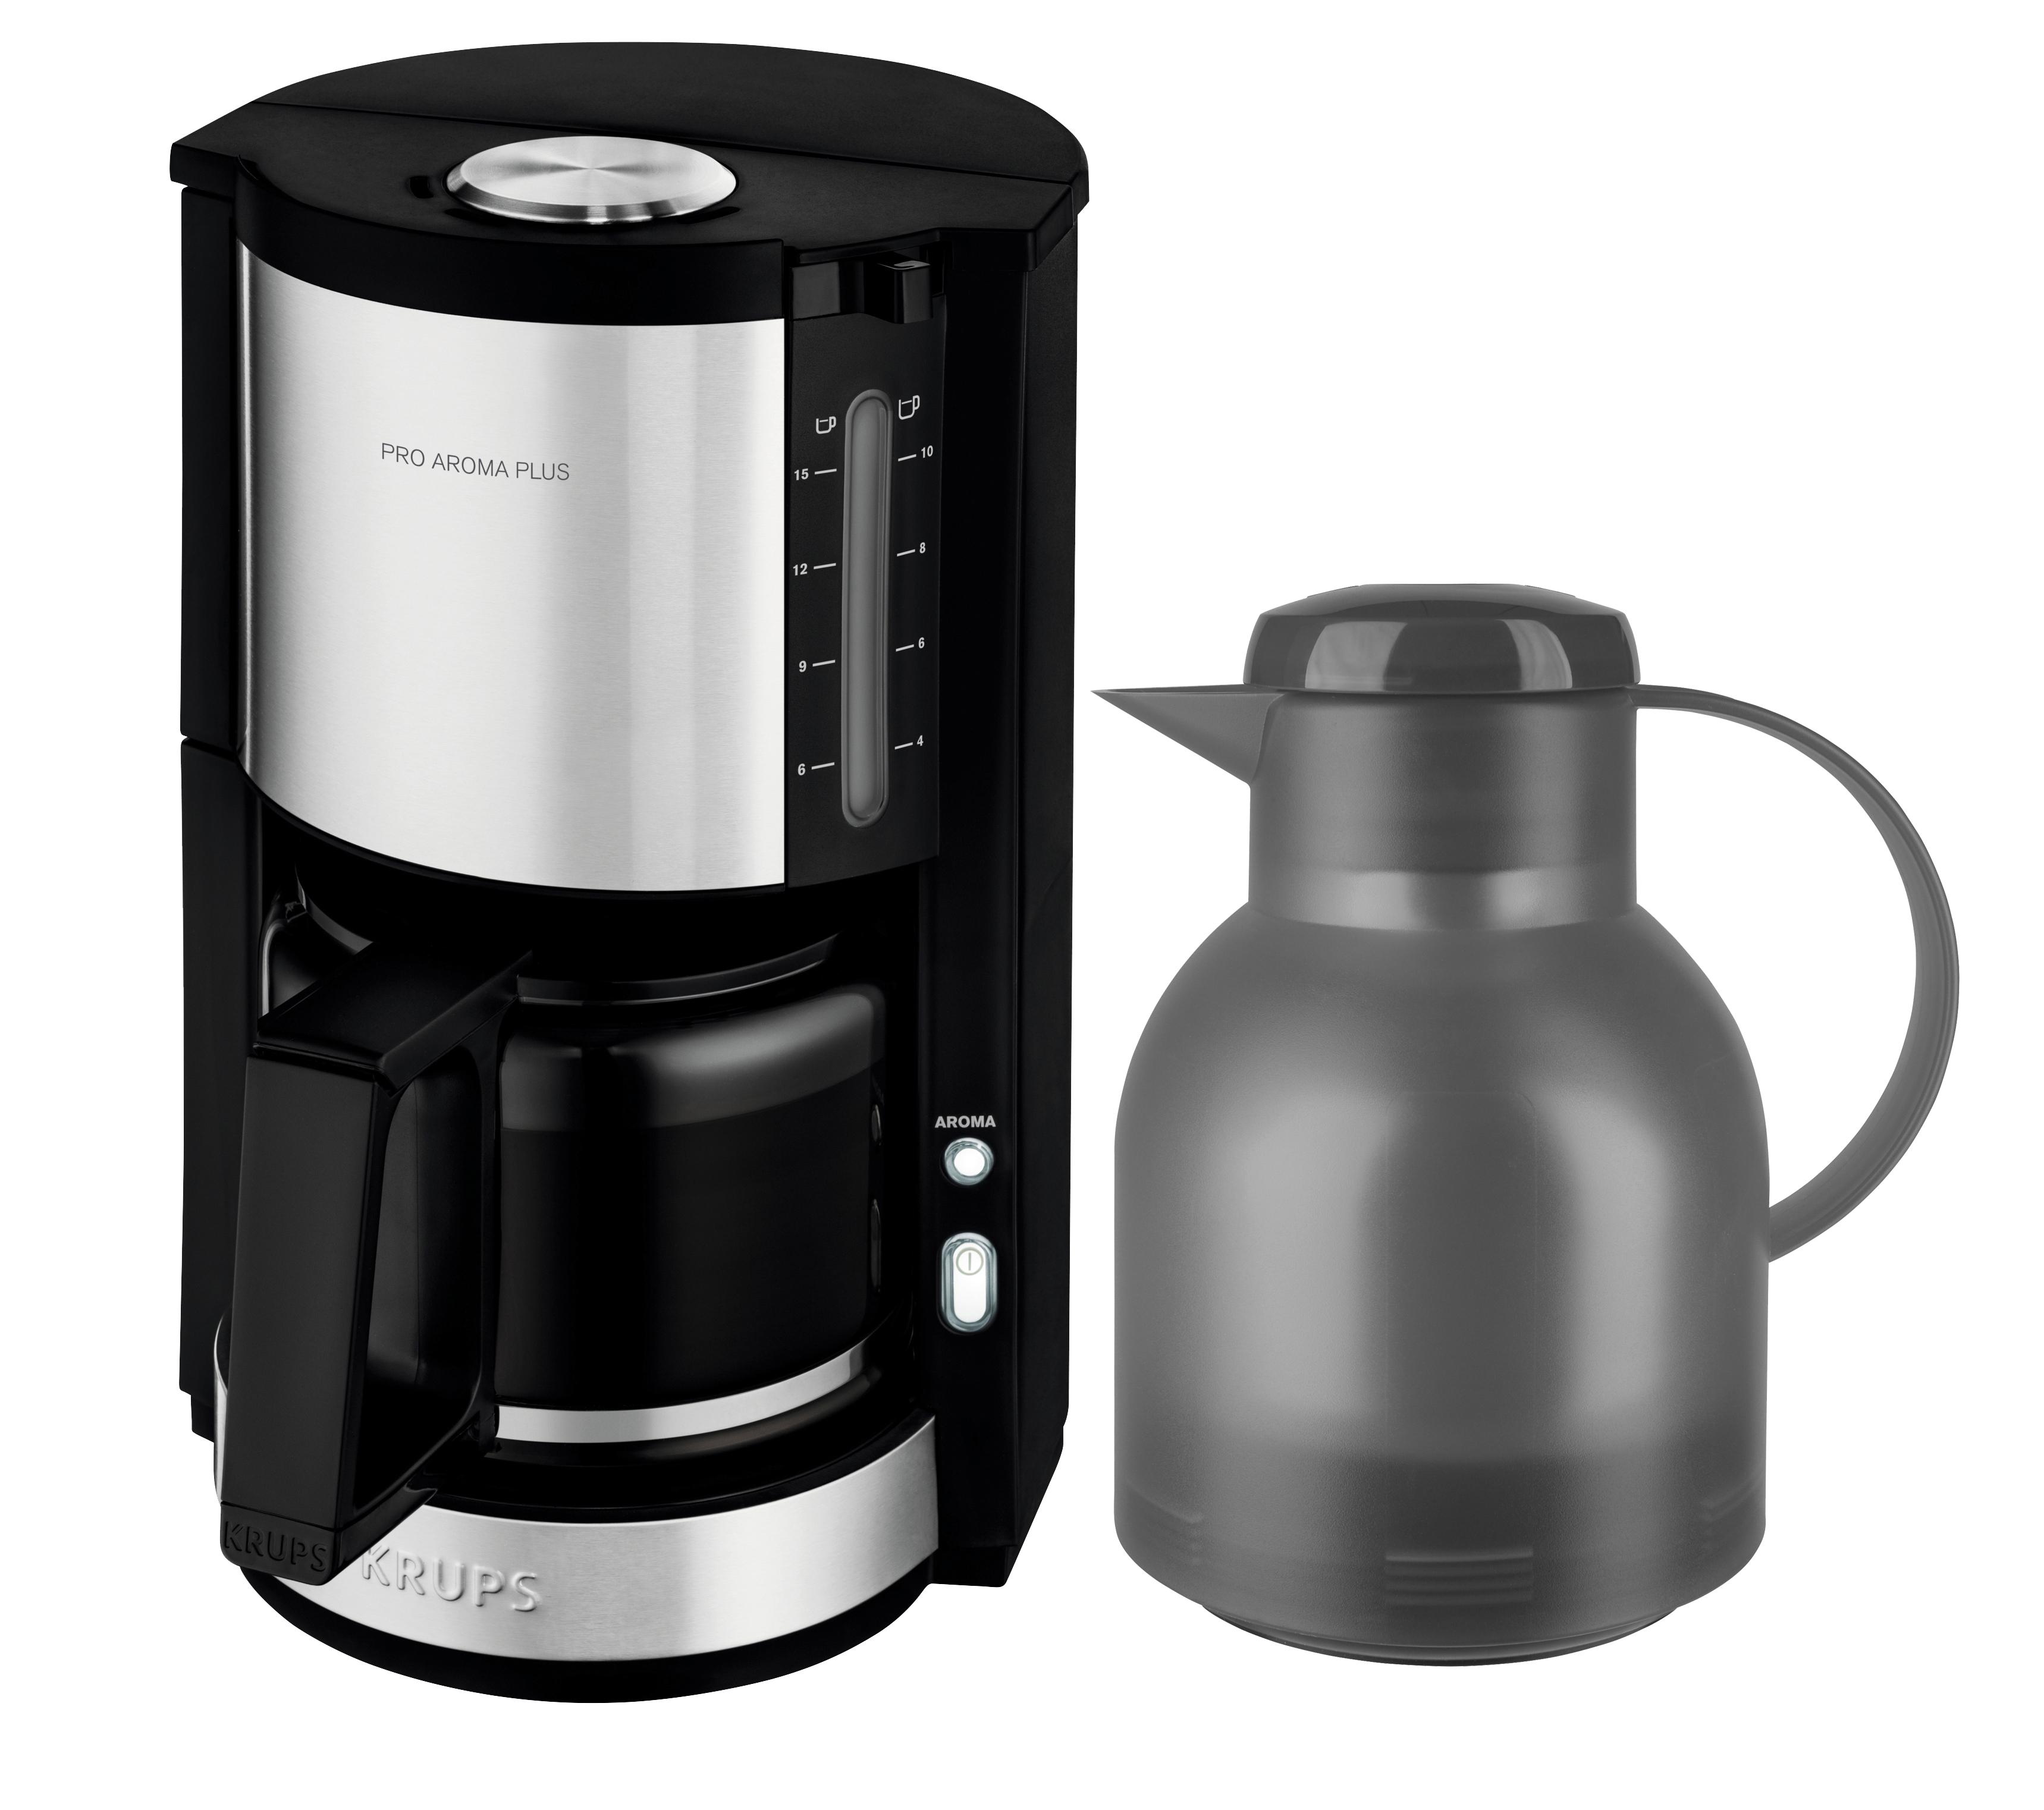 Krups Kaffeemaschine ProAroma Plus KM3210 inkl. Emsa Samba Isolierkanne (grau)